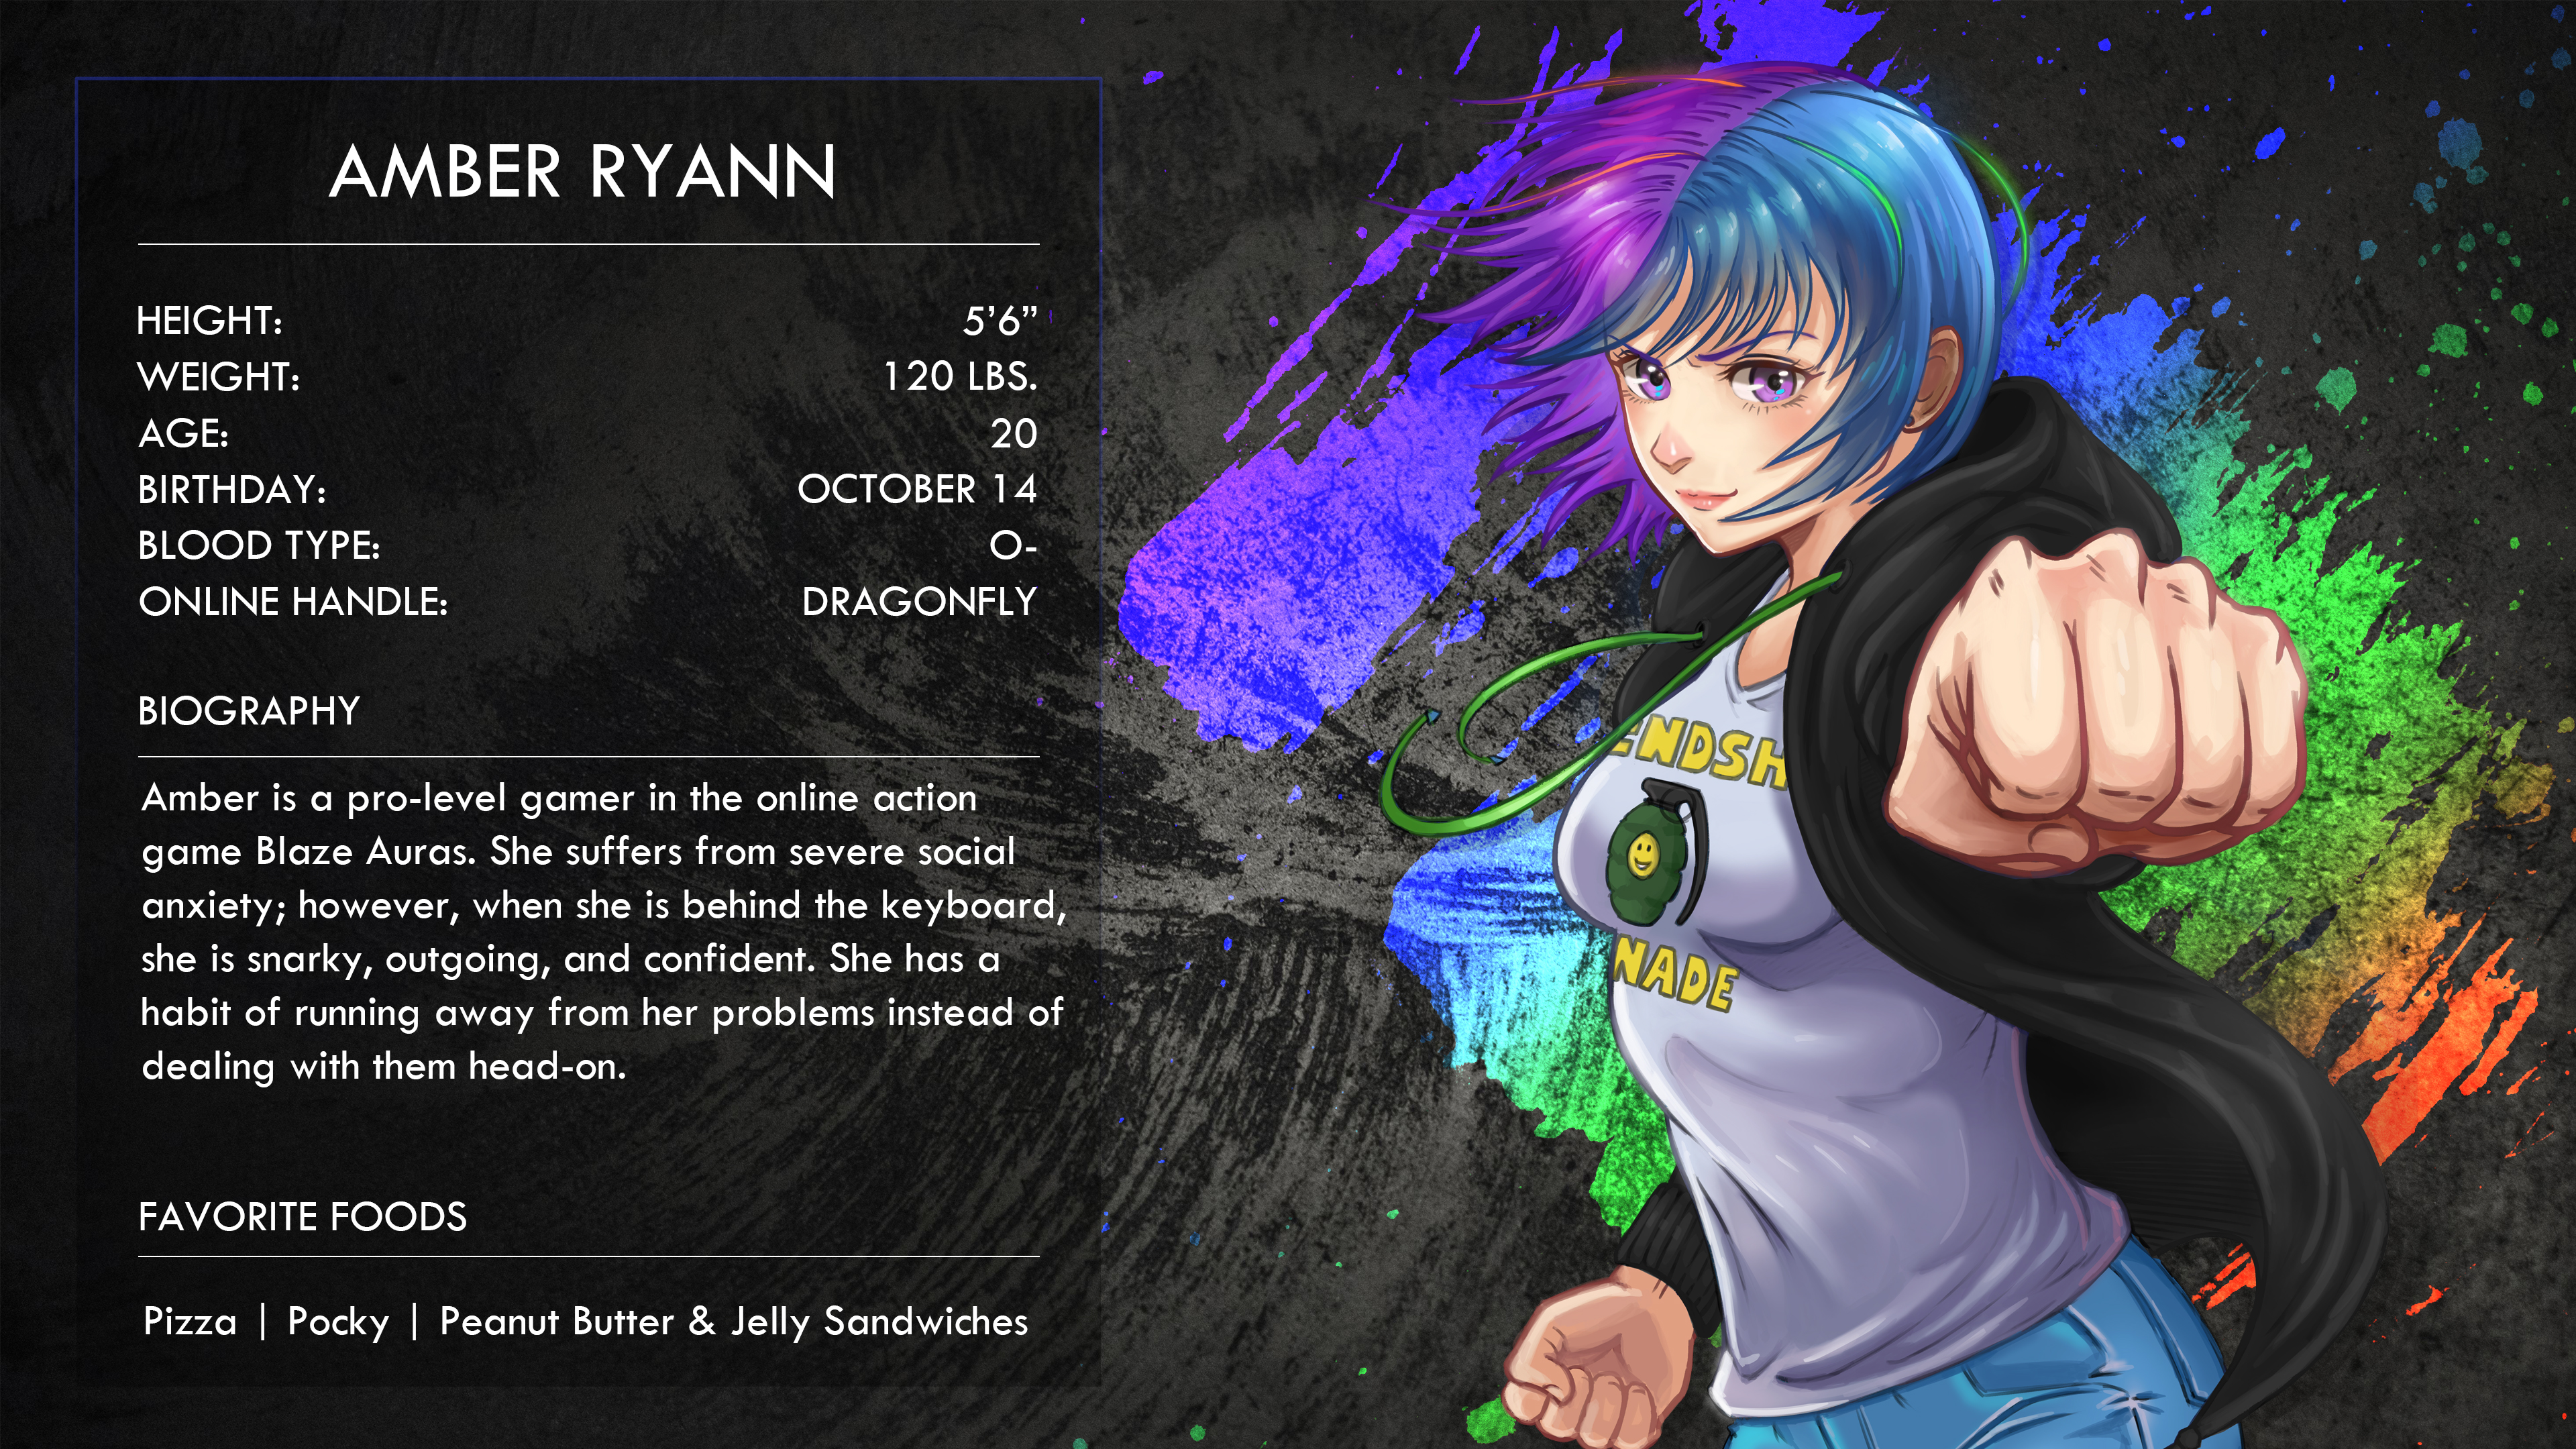 Amber Ryann